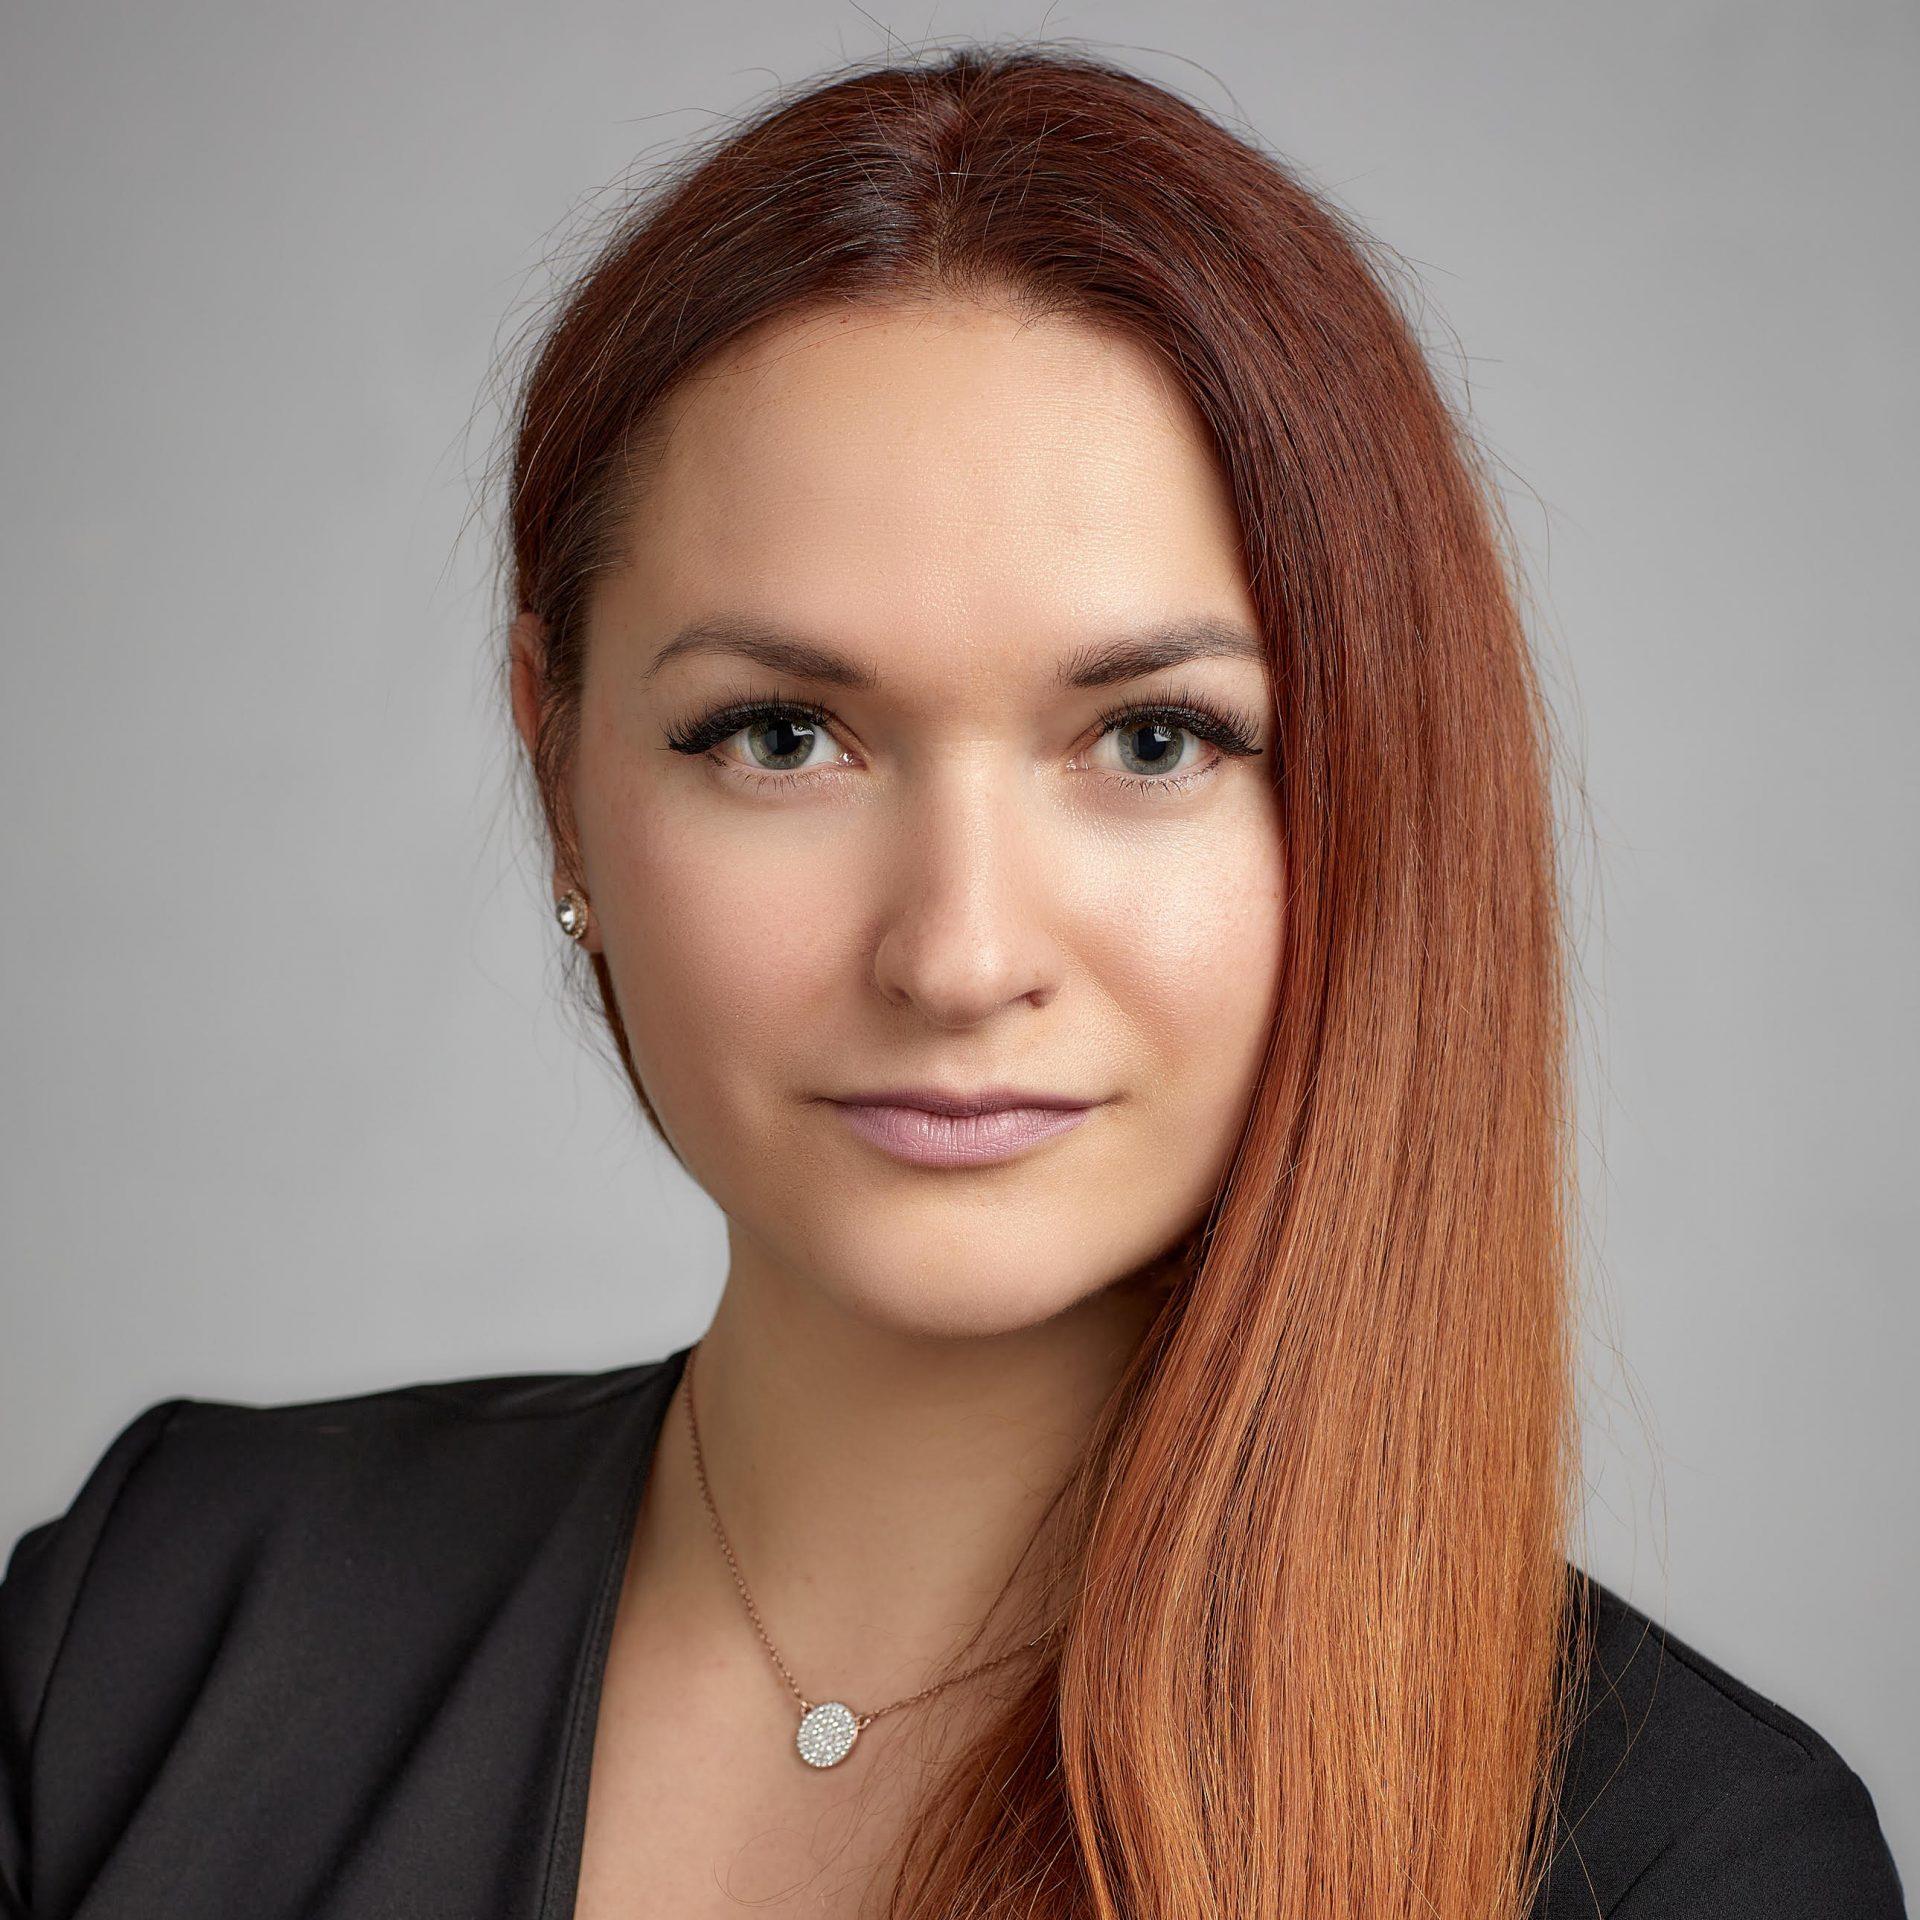 Наталья Гейсари 19